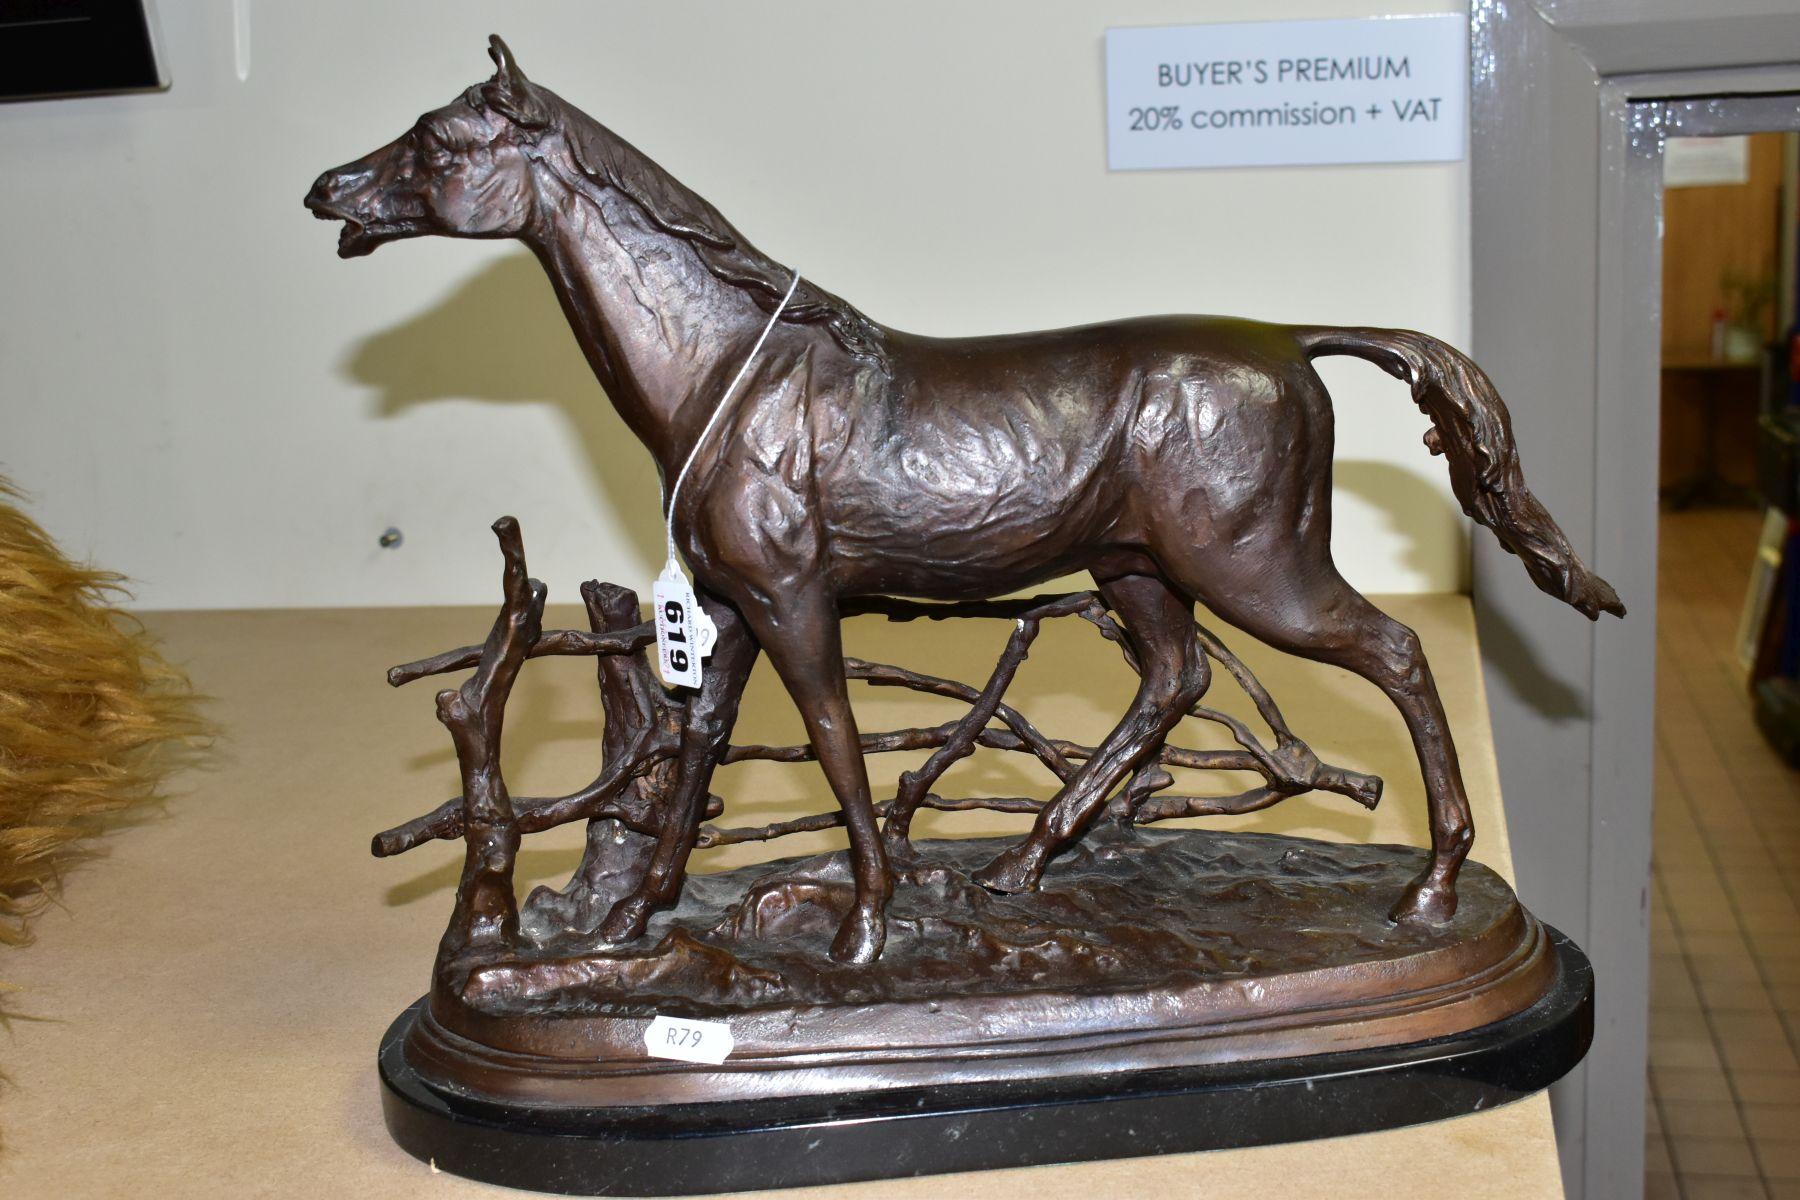 AFTER PIERRE JULES MENE 'A LA BARRIERE' a bronze sculpture of a horse beside a fence, bears a